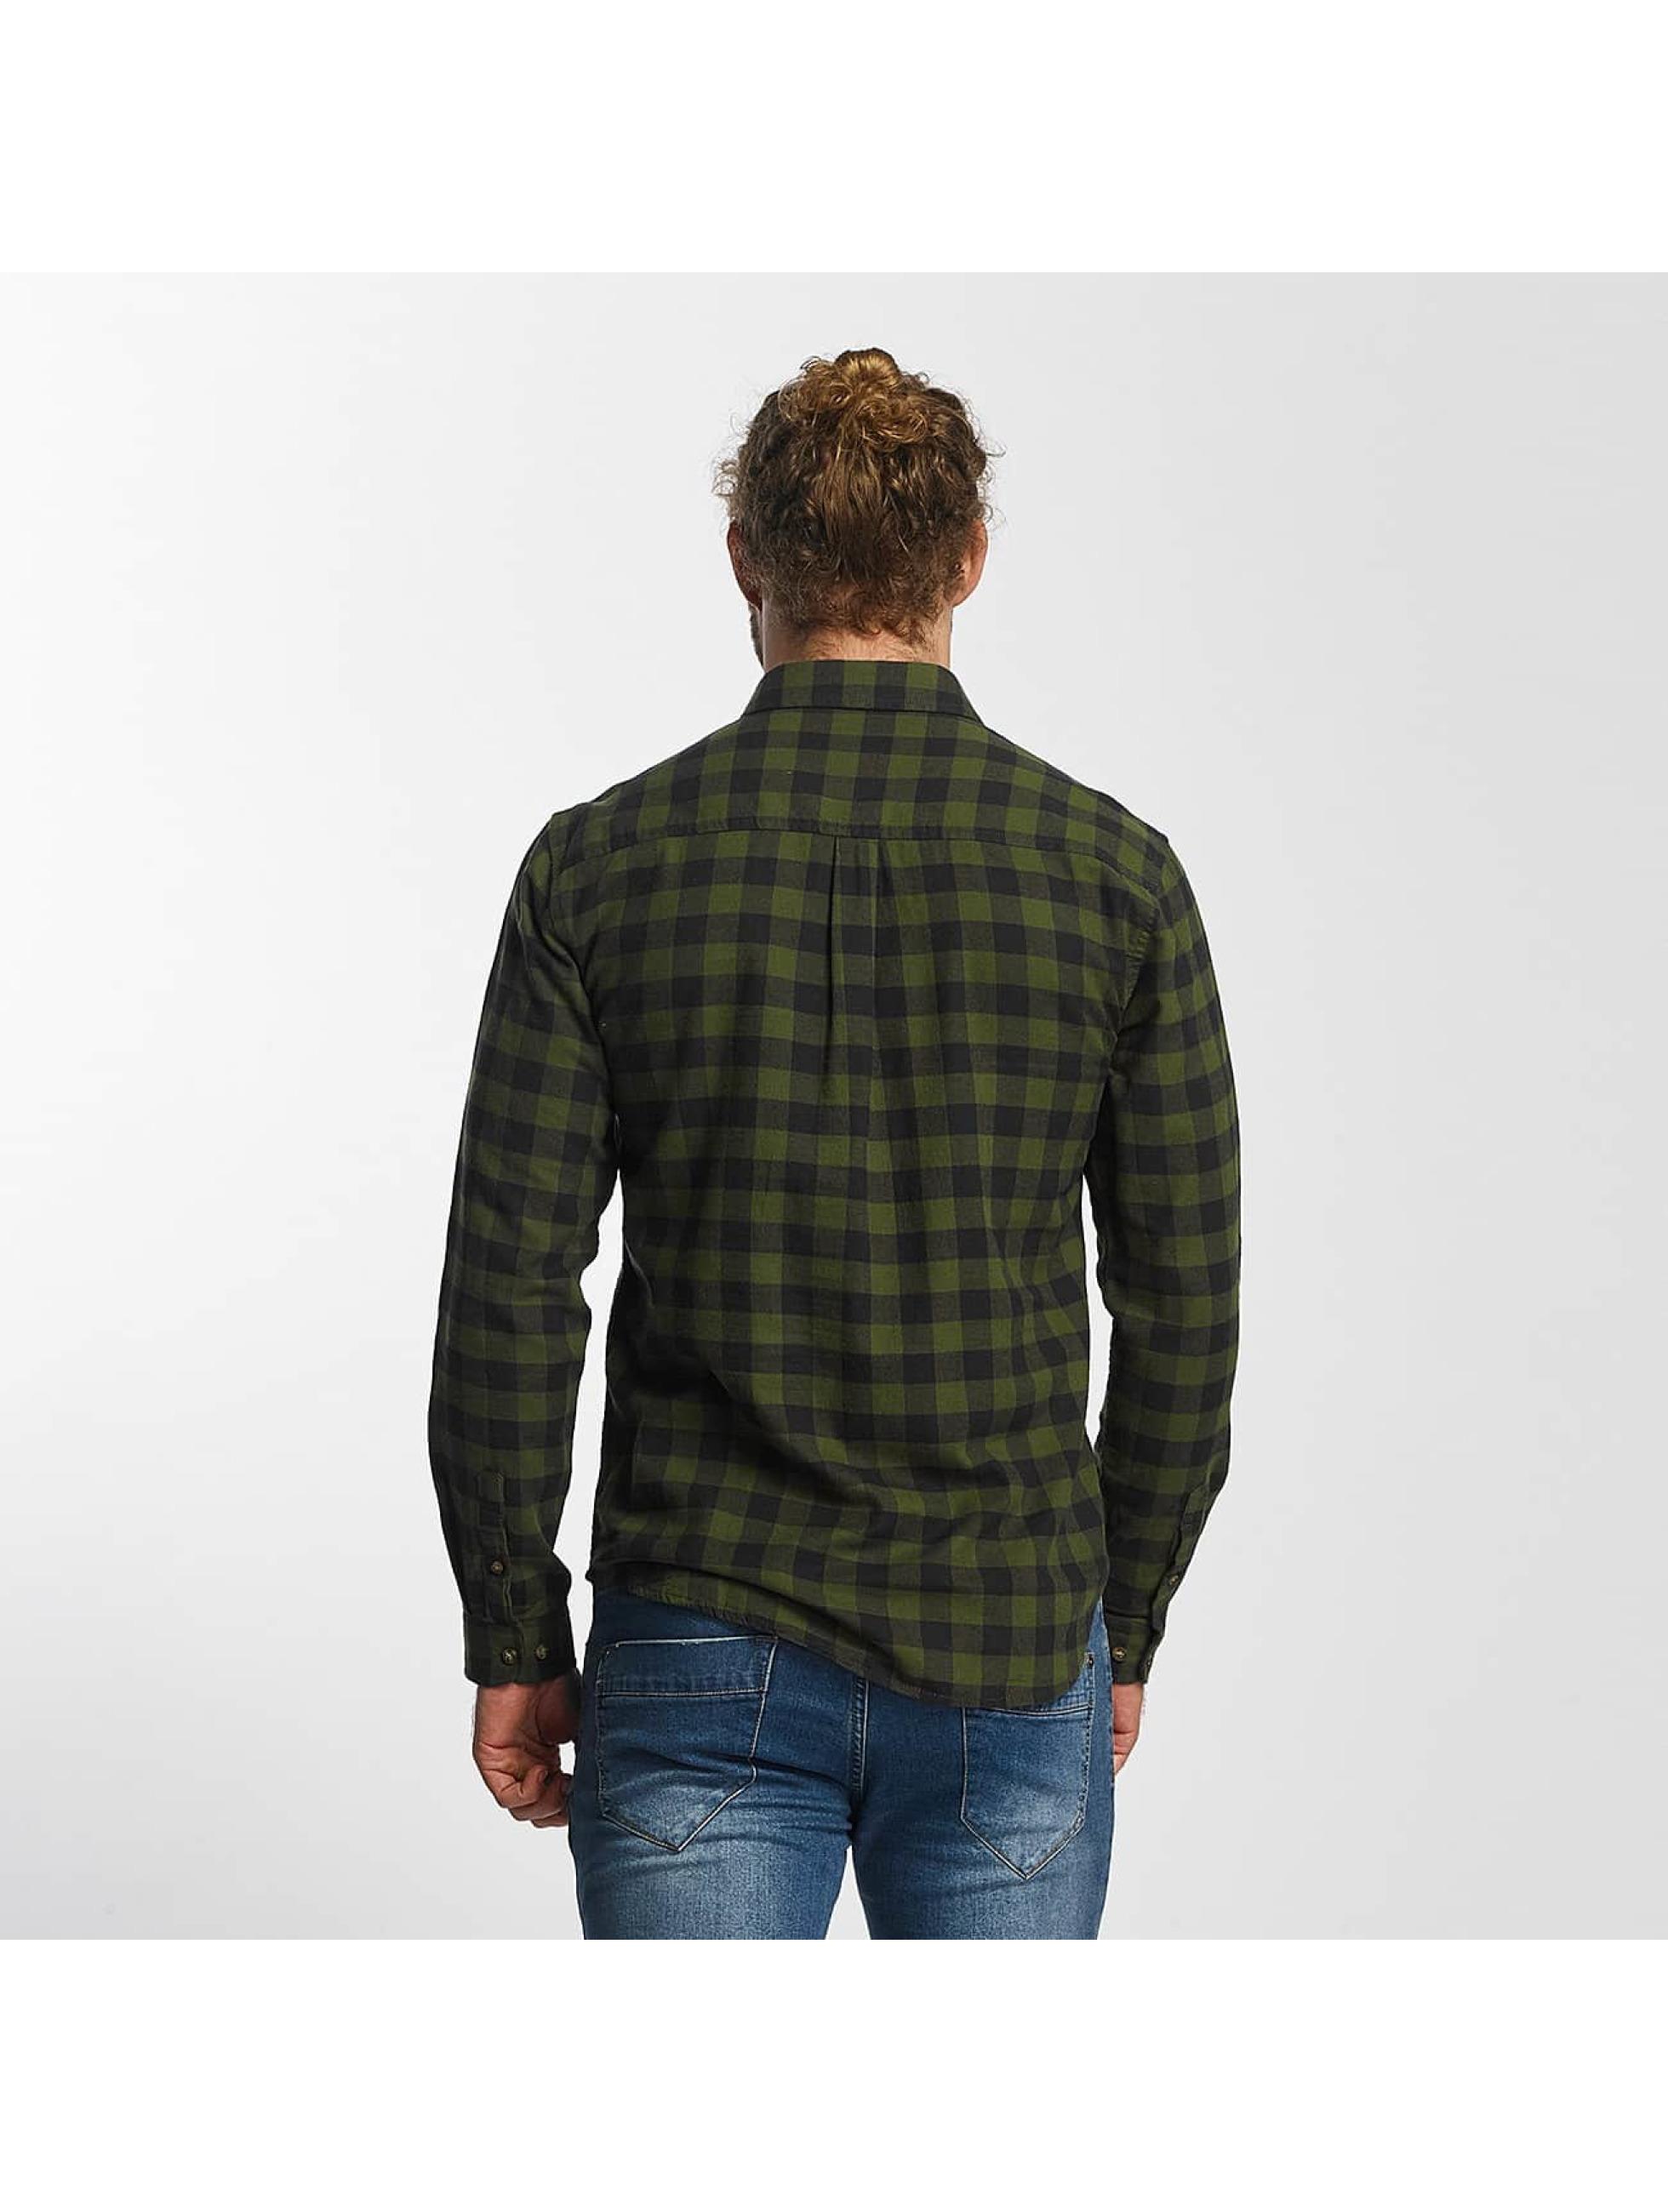 SHINE Original overhemd Checked Twill olijfgroen